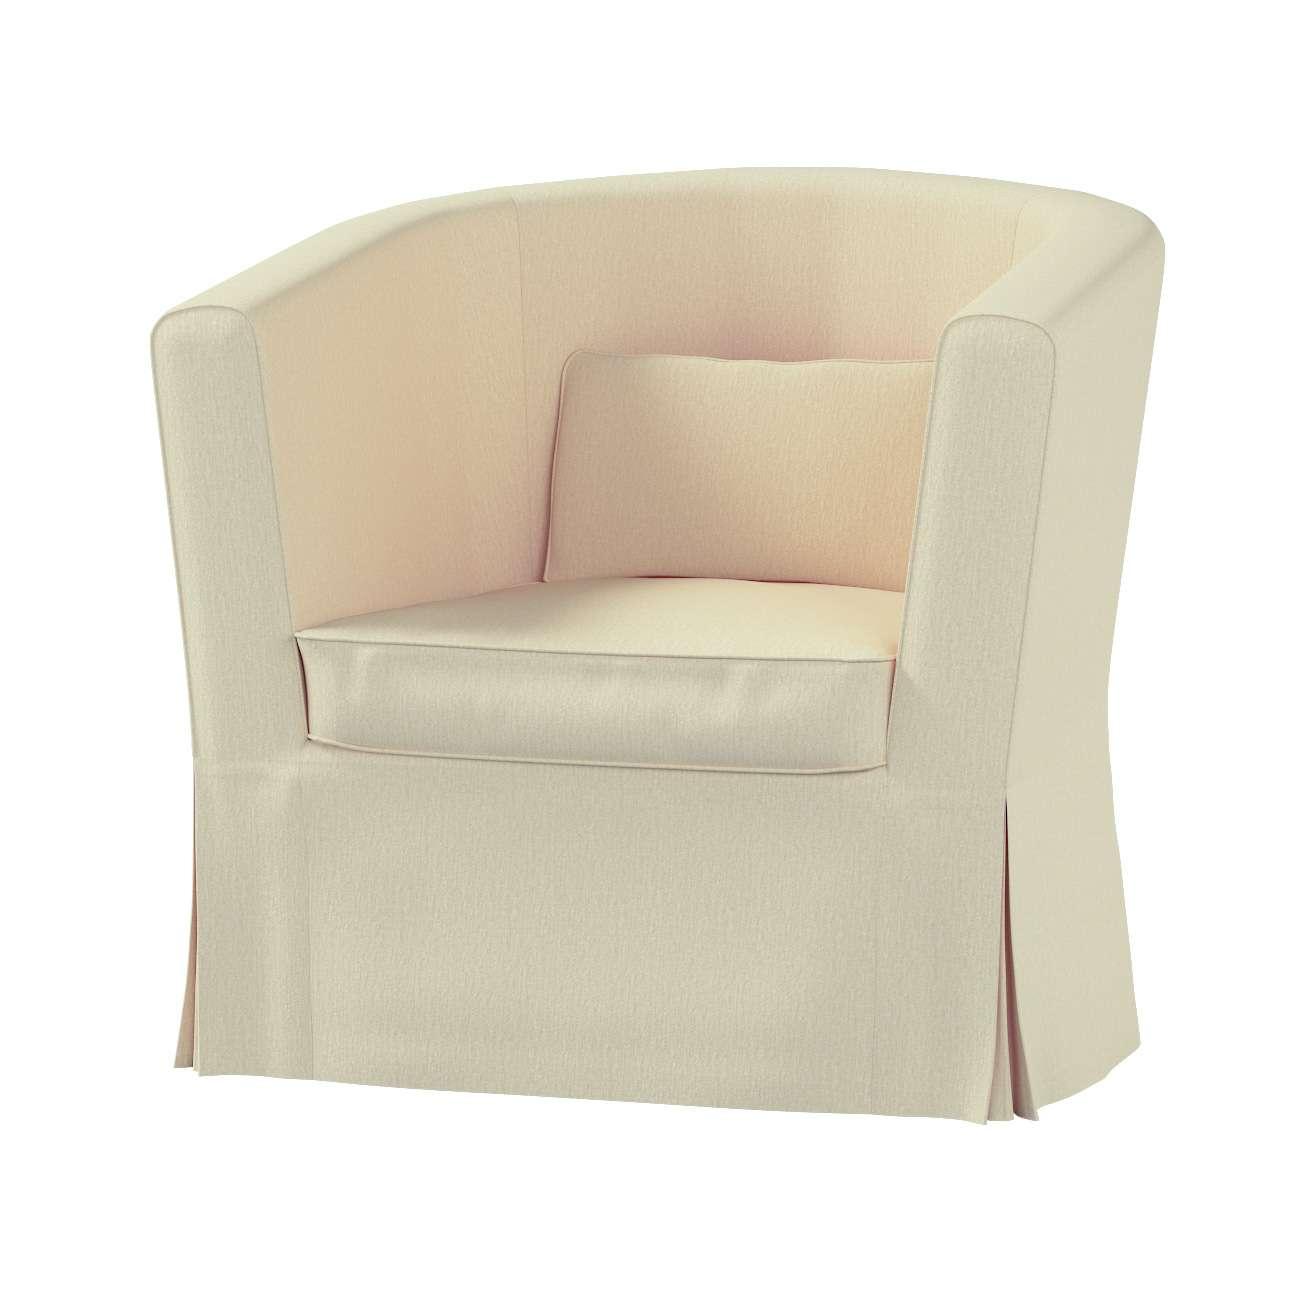 Pokrowiec na fotel Ektorp Tullsta fotel Ektorp Tullsta w kolekcji Chenille, tkanina: 702-22